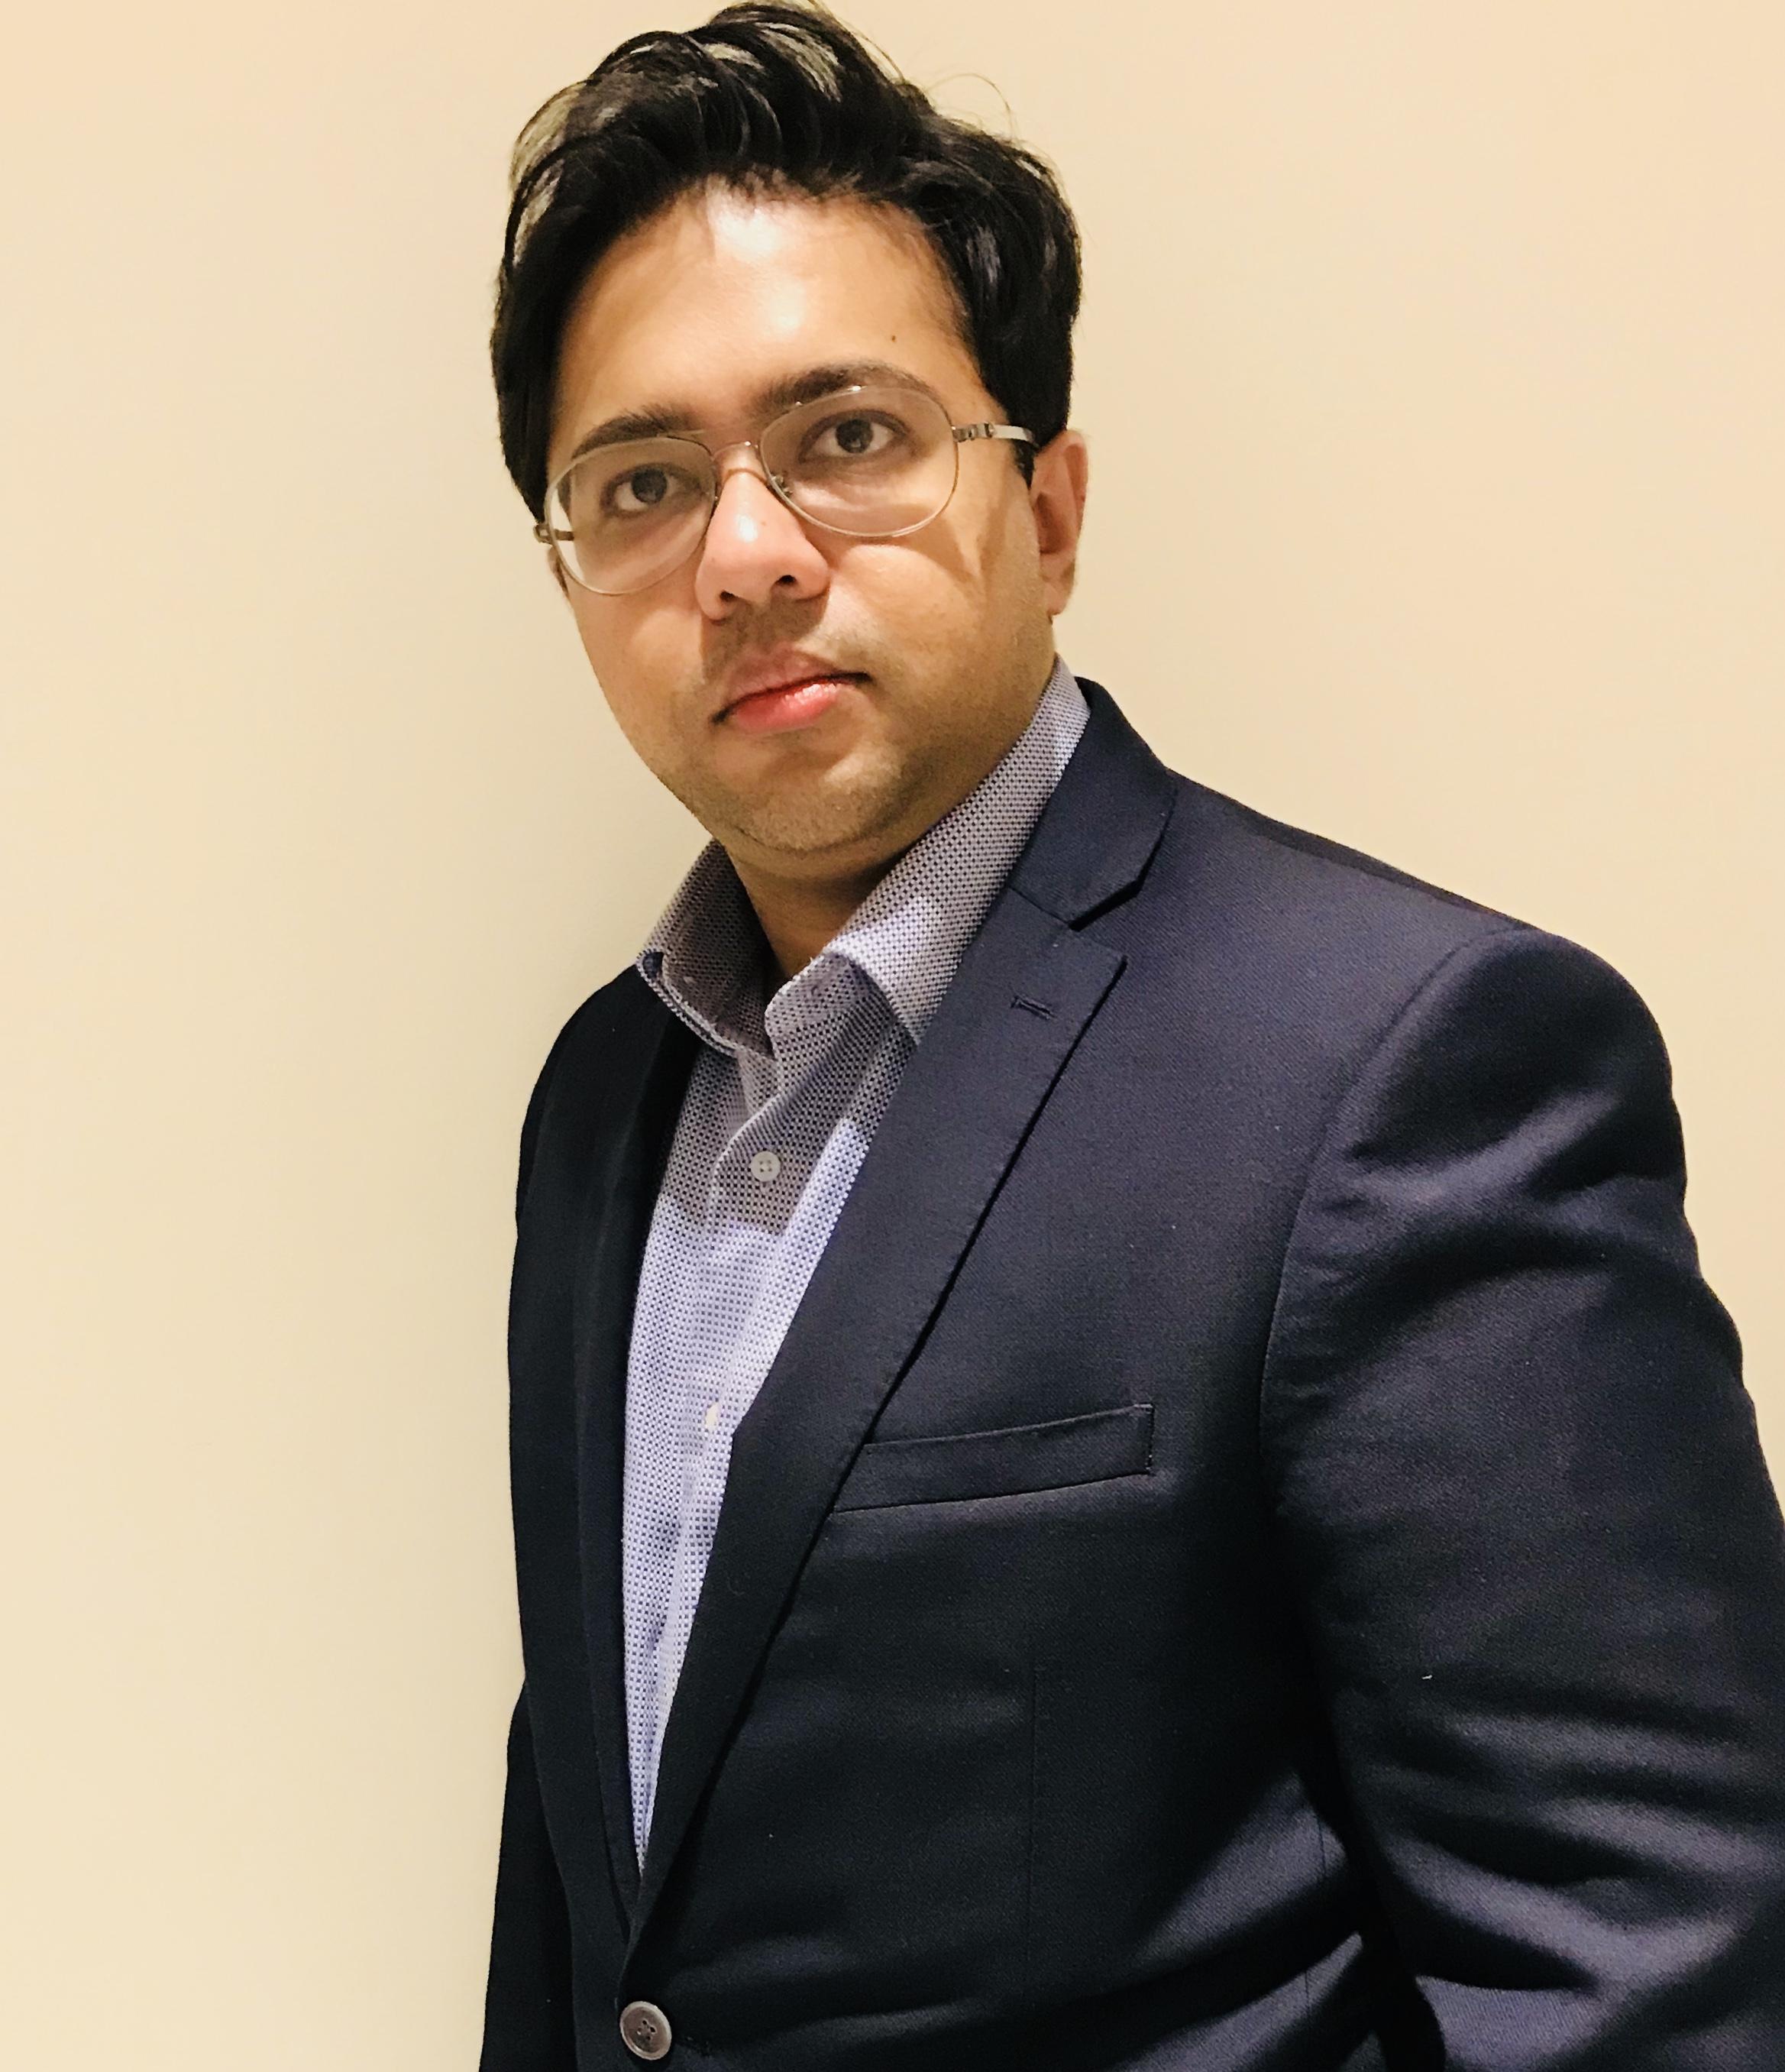 Abhishek Chatterjee, CEO, Tookitaki